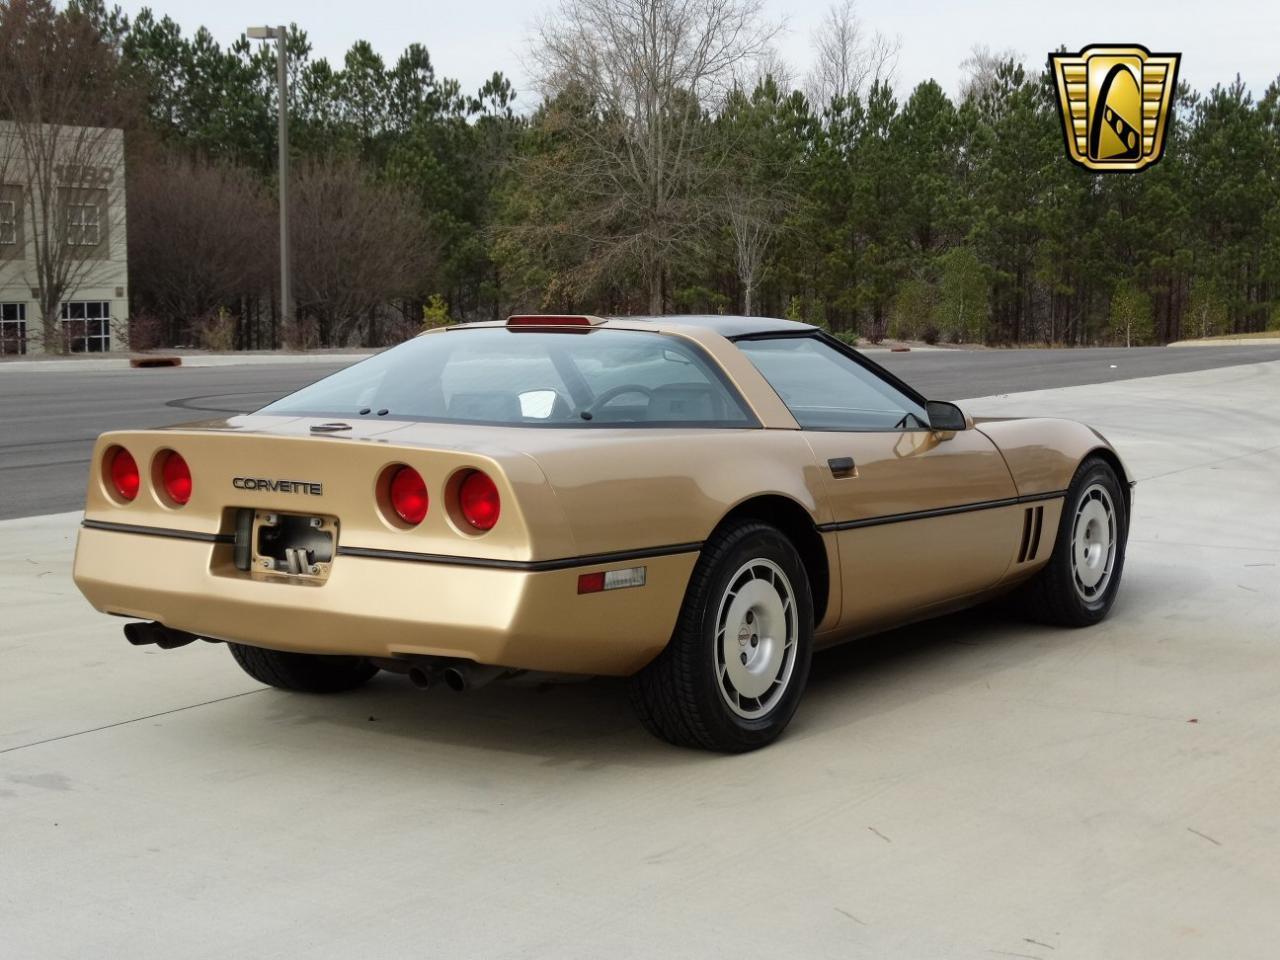 Large Picture of 1986 Corvette located in Georgia - $11,595.00 - KF5W